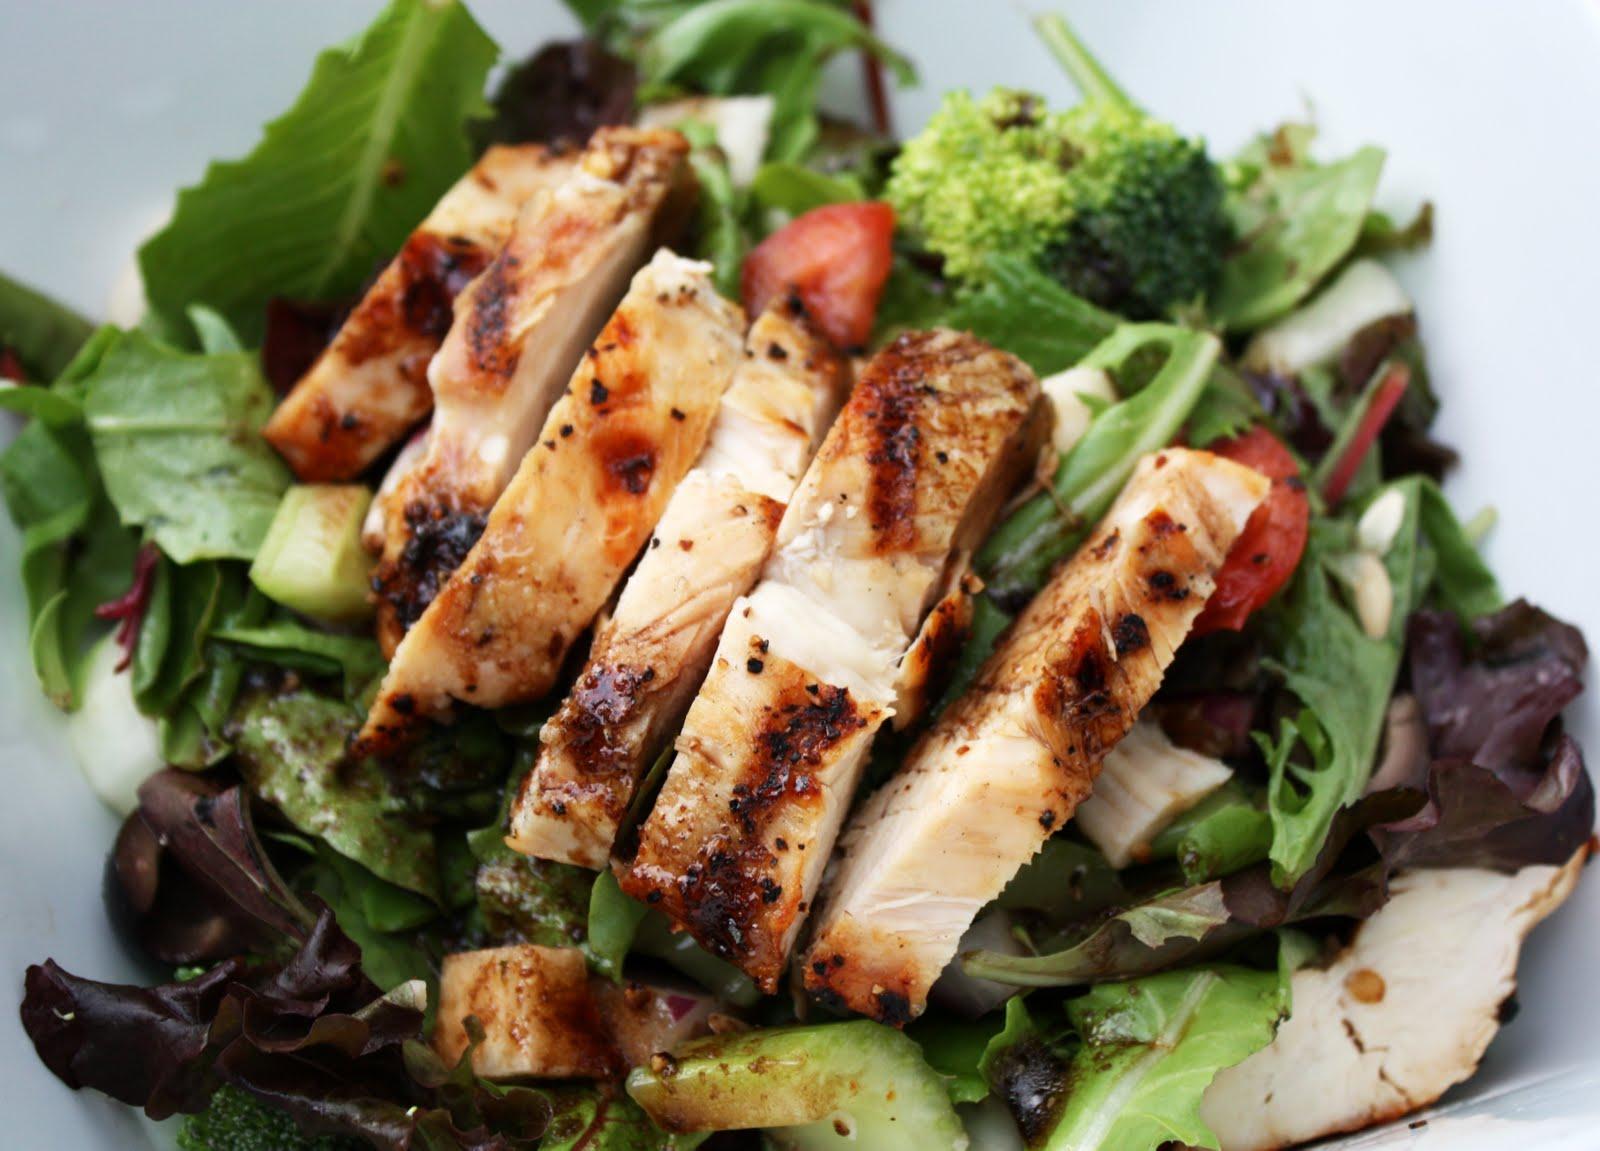 Grilled chicken salad primal palate paleo recipes grilled chicken salad forumfinder Choice Image